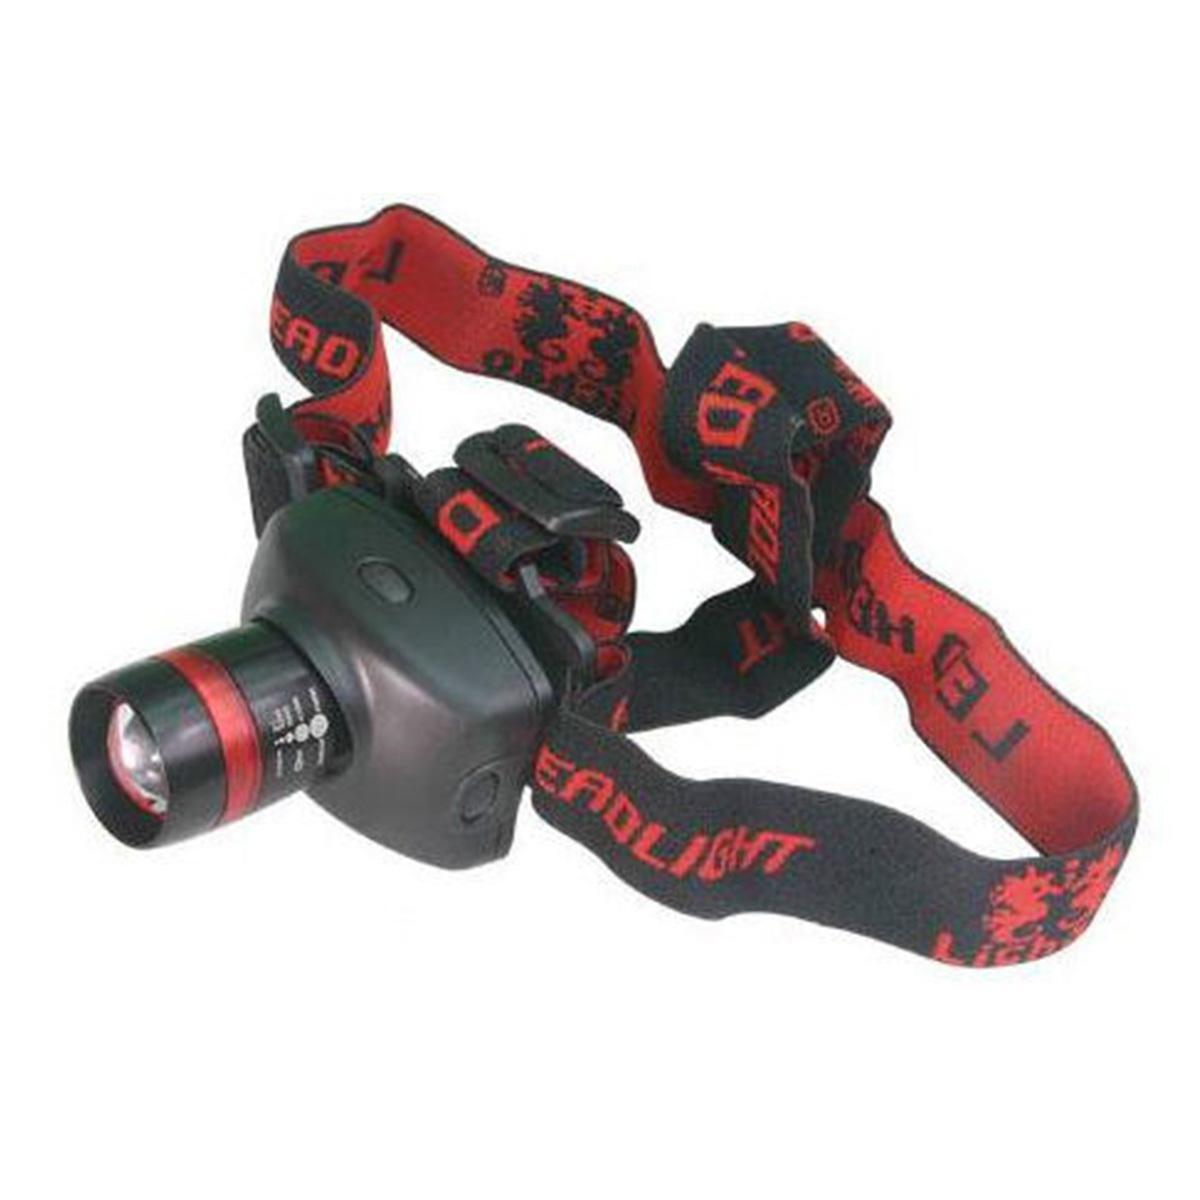 43-2032-led-stirnlampe-lumatic-head-super-focus-ansicht1-1200x1200px.jpg